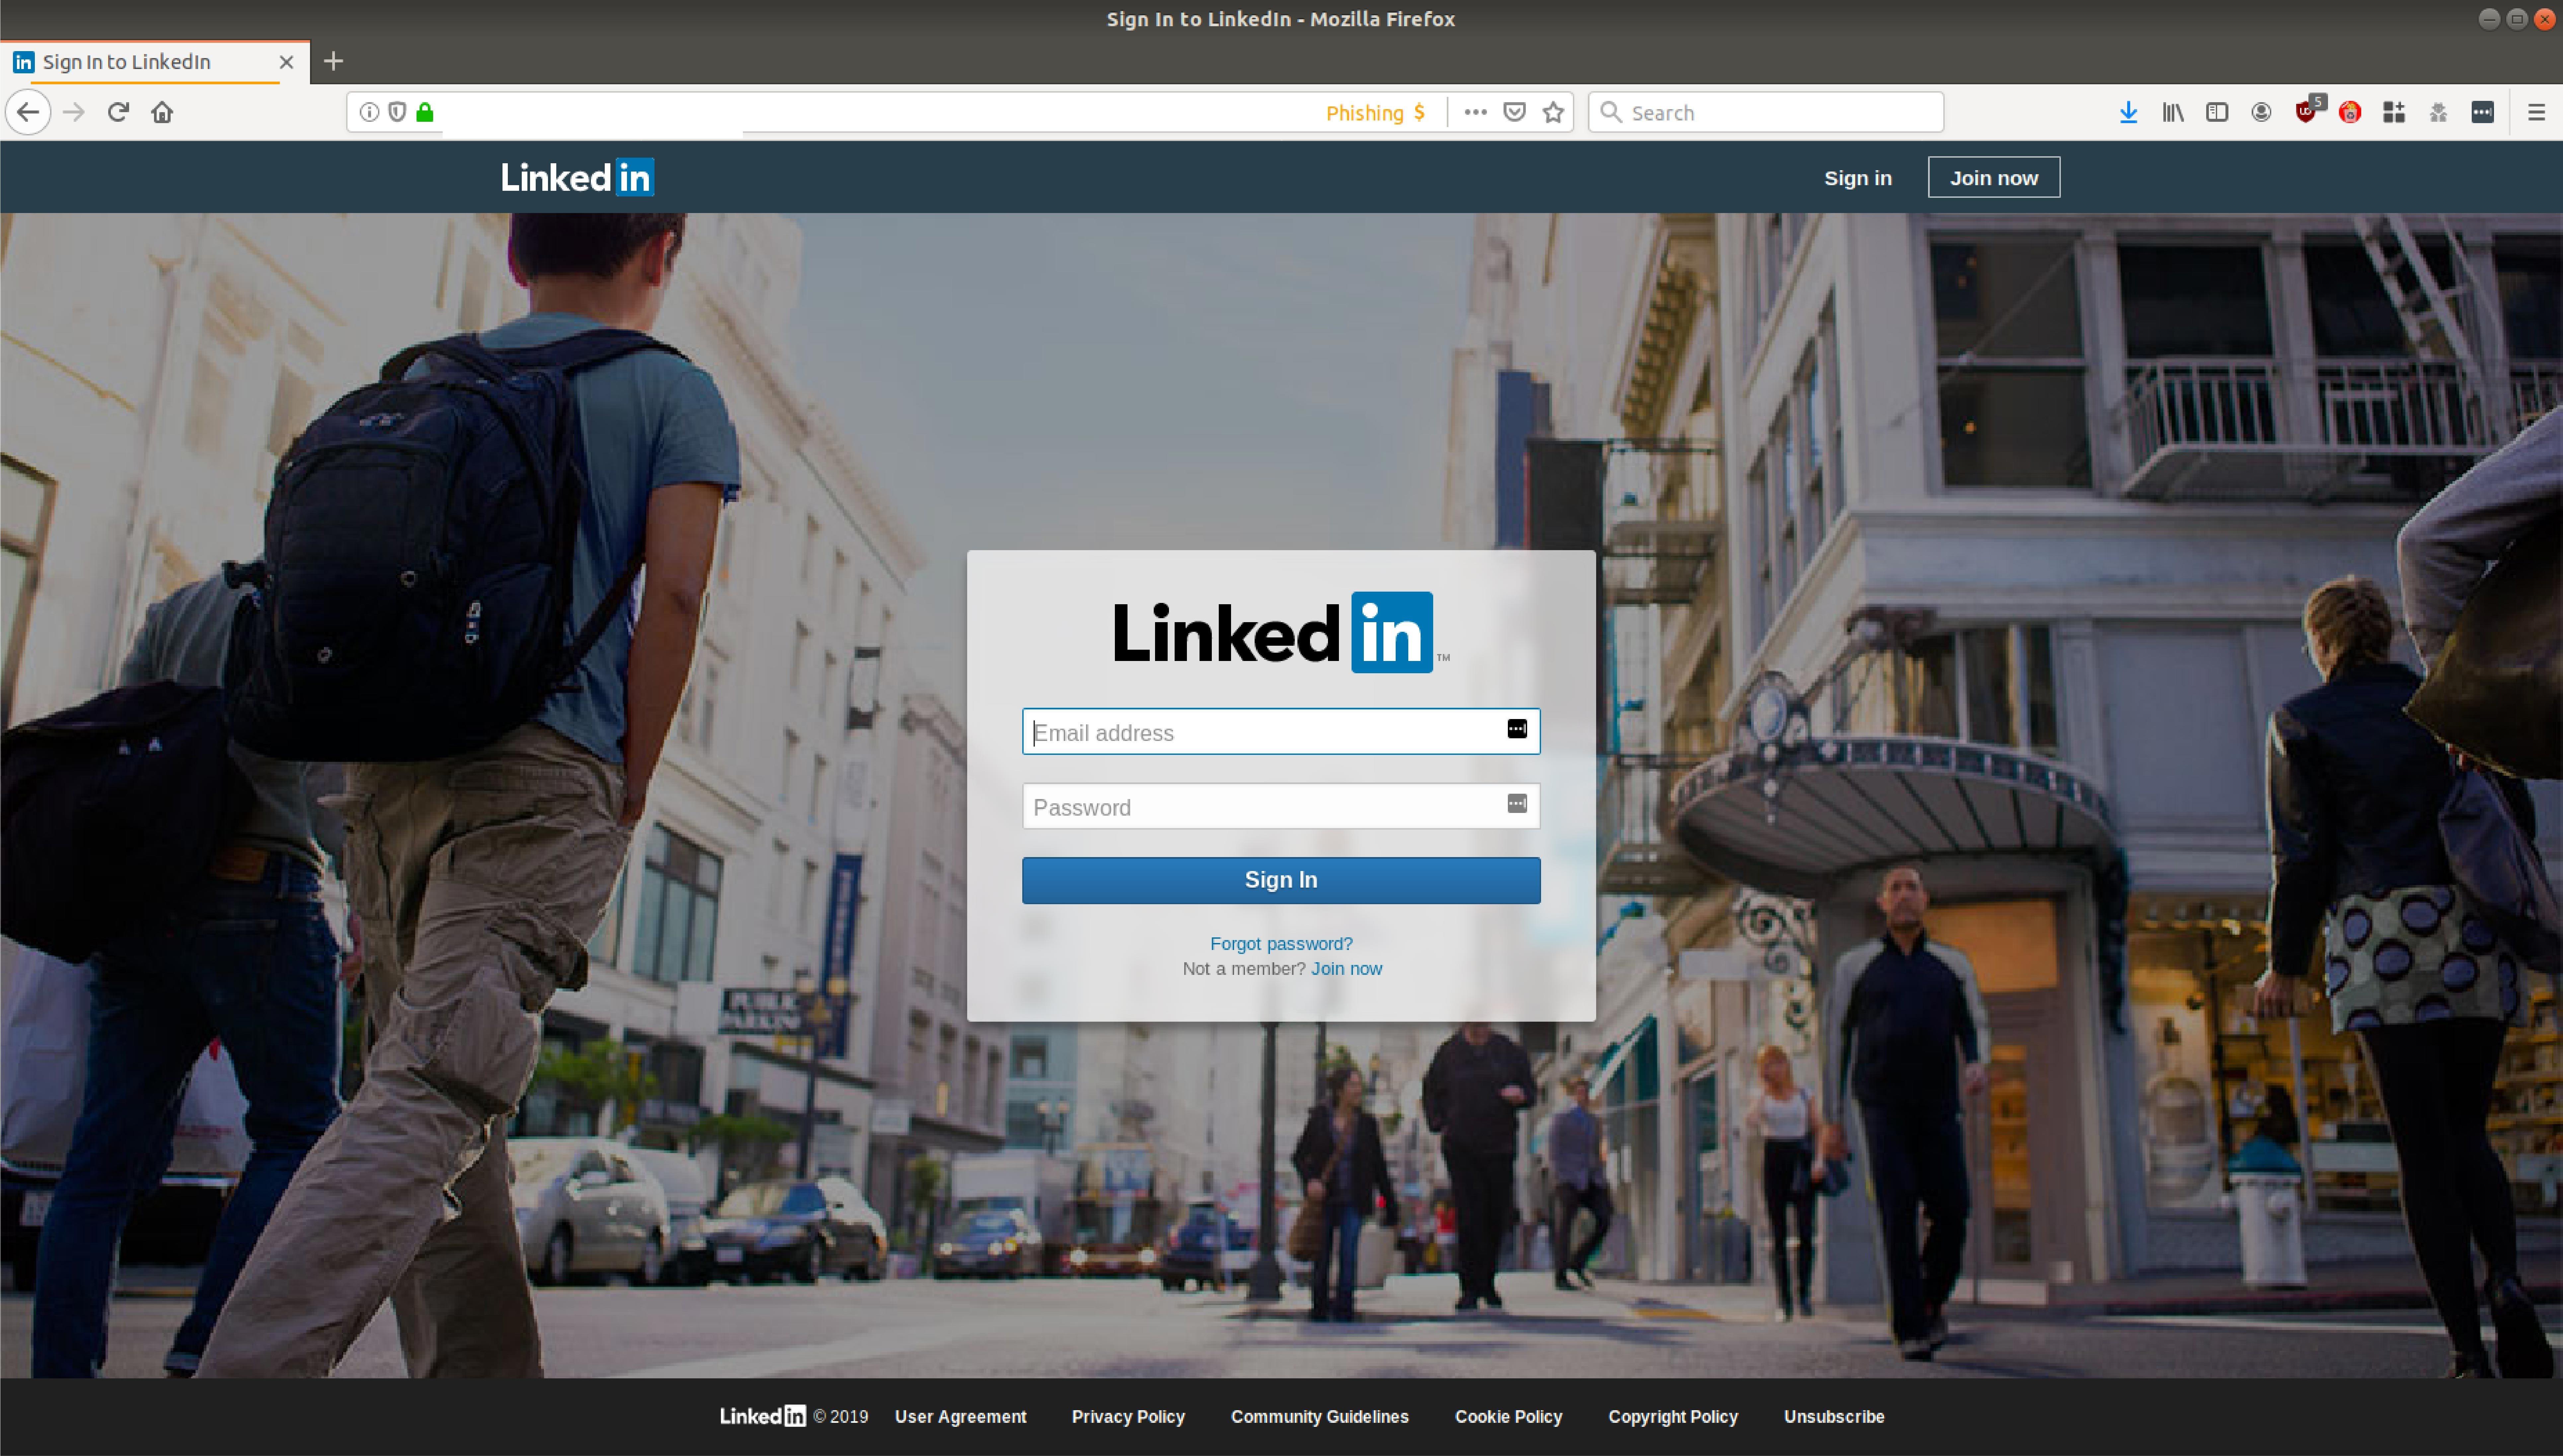 LinkedIn edited